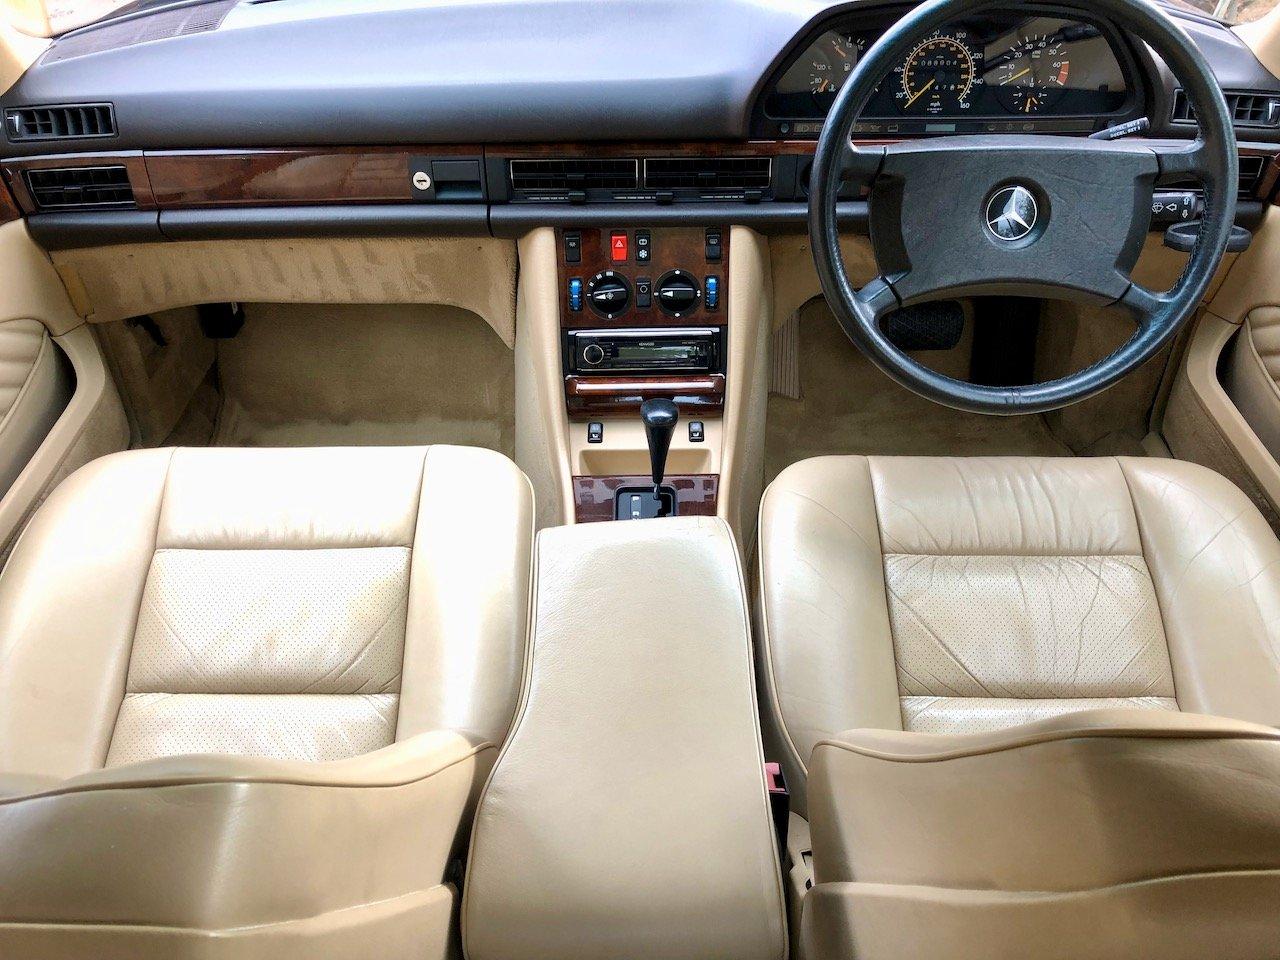 1989 **DEPOSIT TAKEN** Mercedes 500SEC C126 560SEC 420 SEC For Sale (picture 6 of 6)